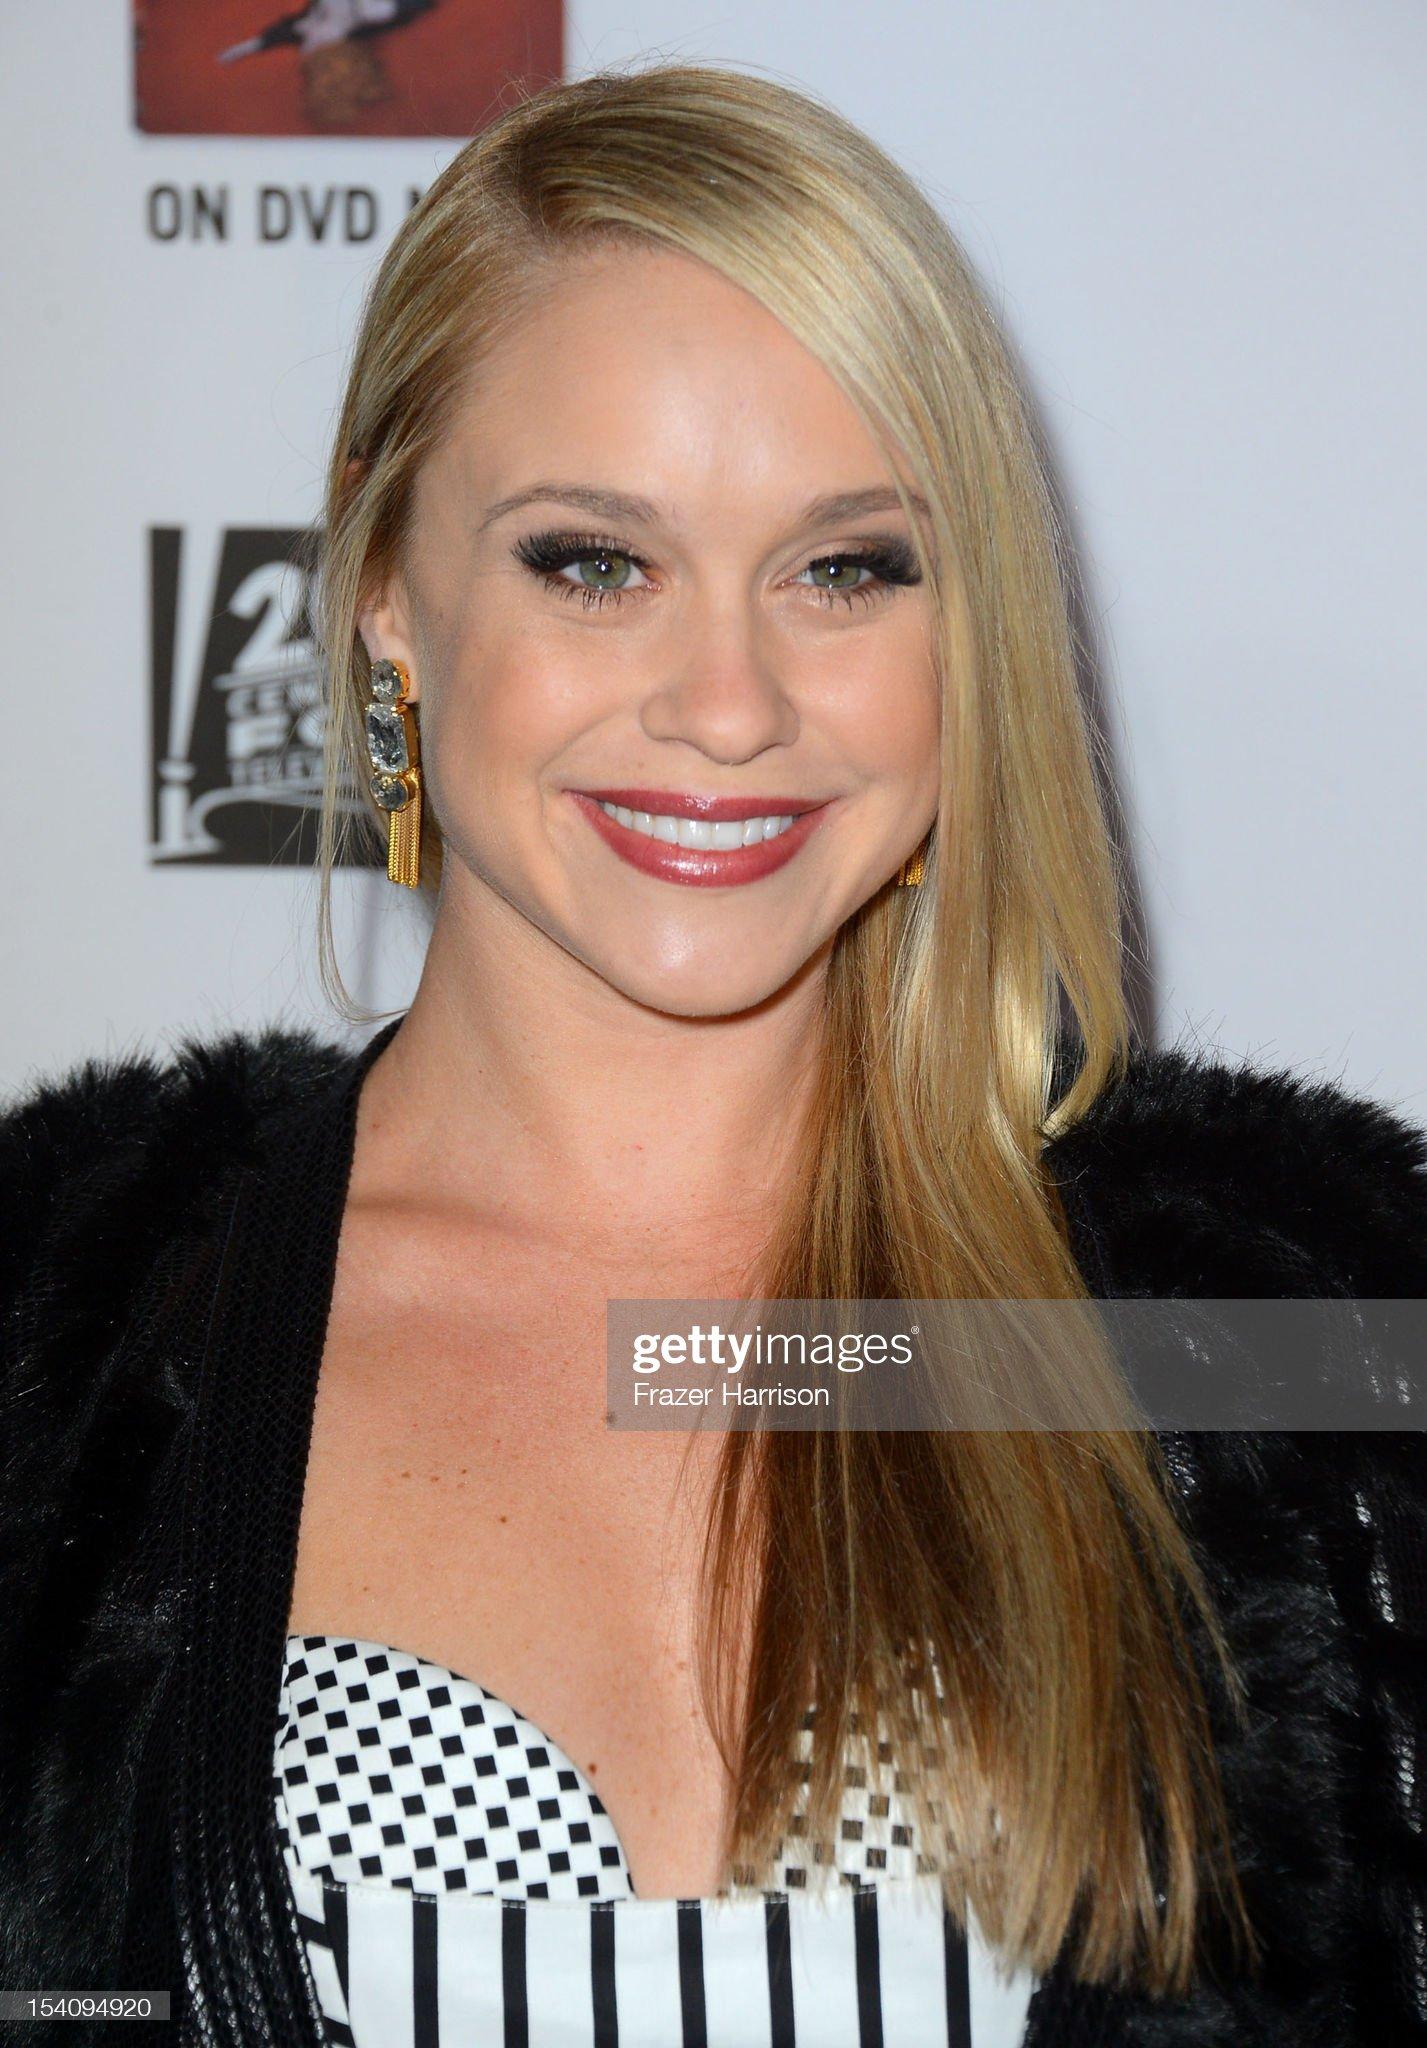 Ojos verdes - Famosas y famosos con los ojos de color VERDE Actress-becca-tobin-arrives-at-the-premiere-screening-of-fxs-american-picture-id154094920?s=2048x2048